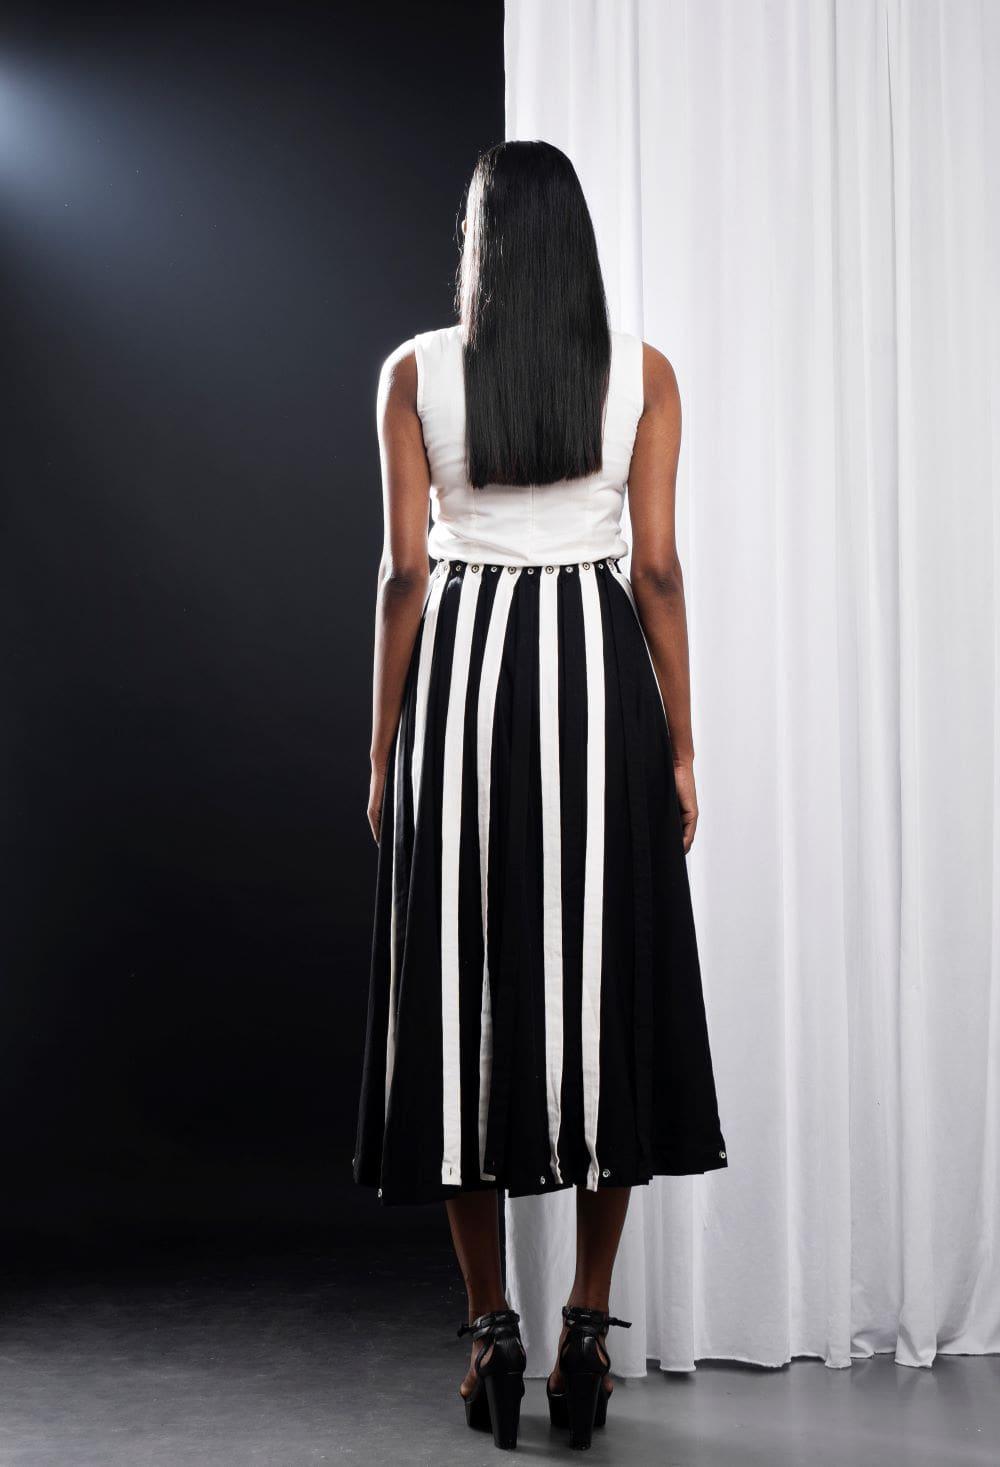 STOREAT44   Best Black & White Clothing Brand   5